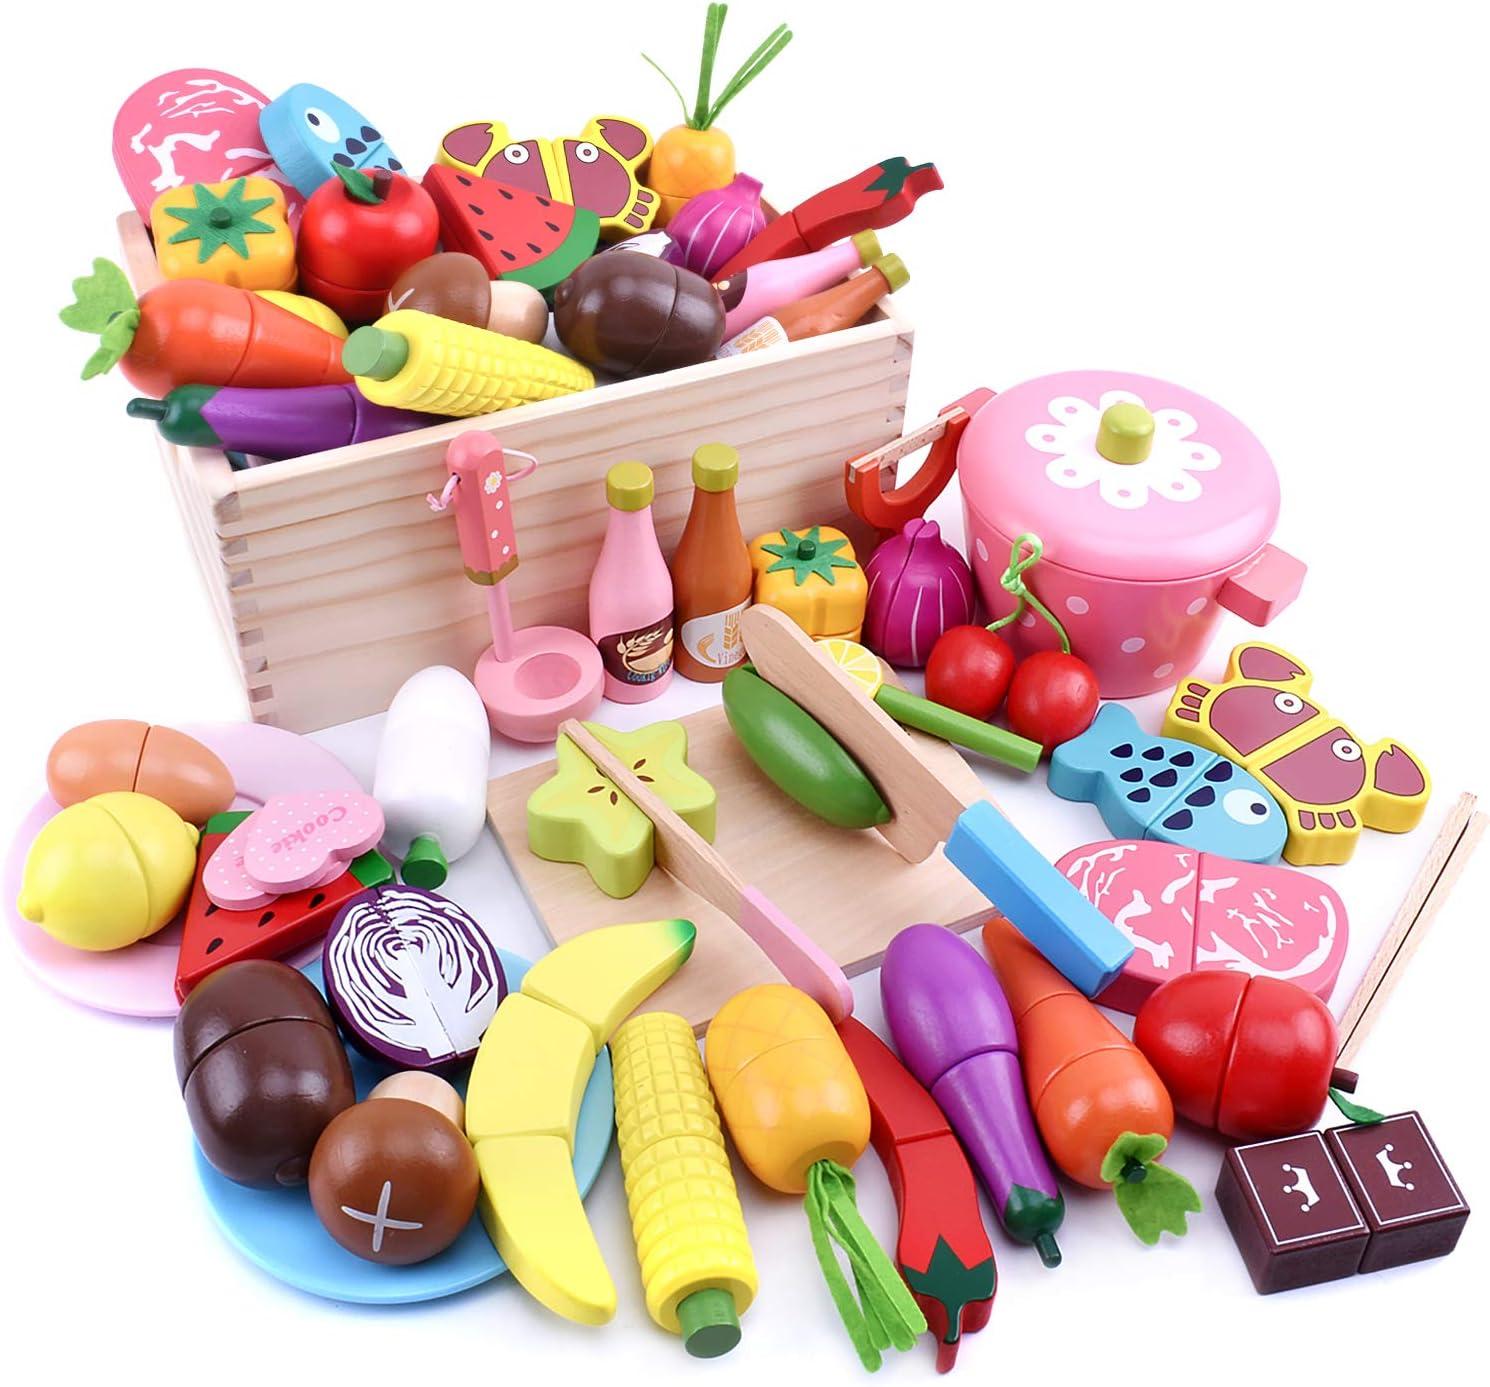 Ansoro おままごとセット 木製 磁石 厨房おもちゃ 食品衛生法検査済 37種セット 100%天然素材